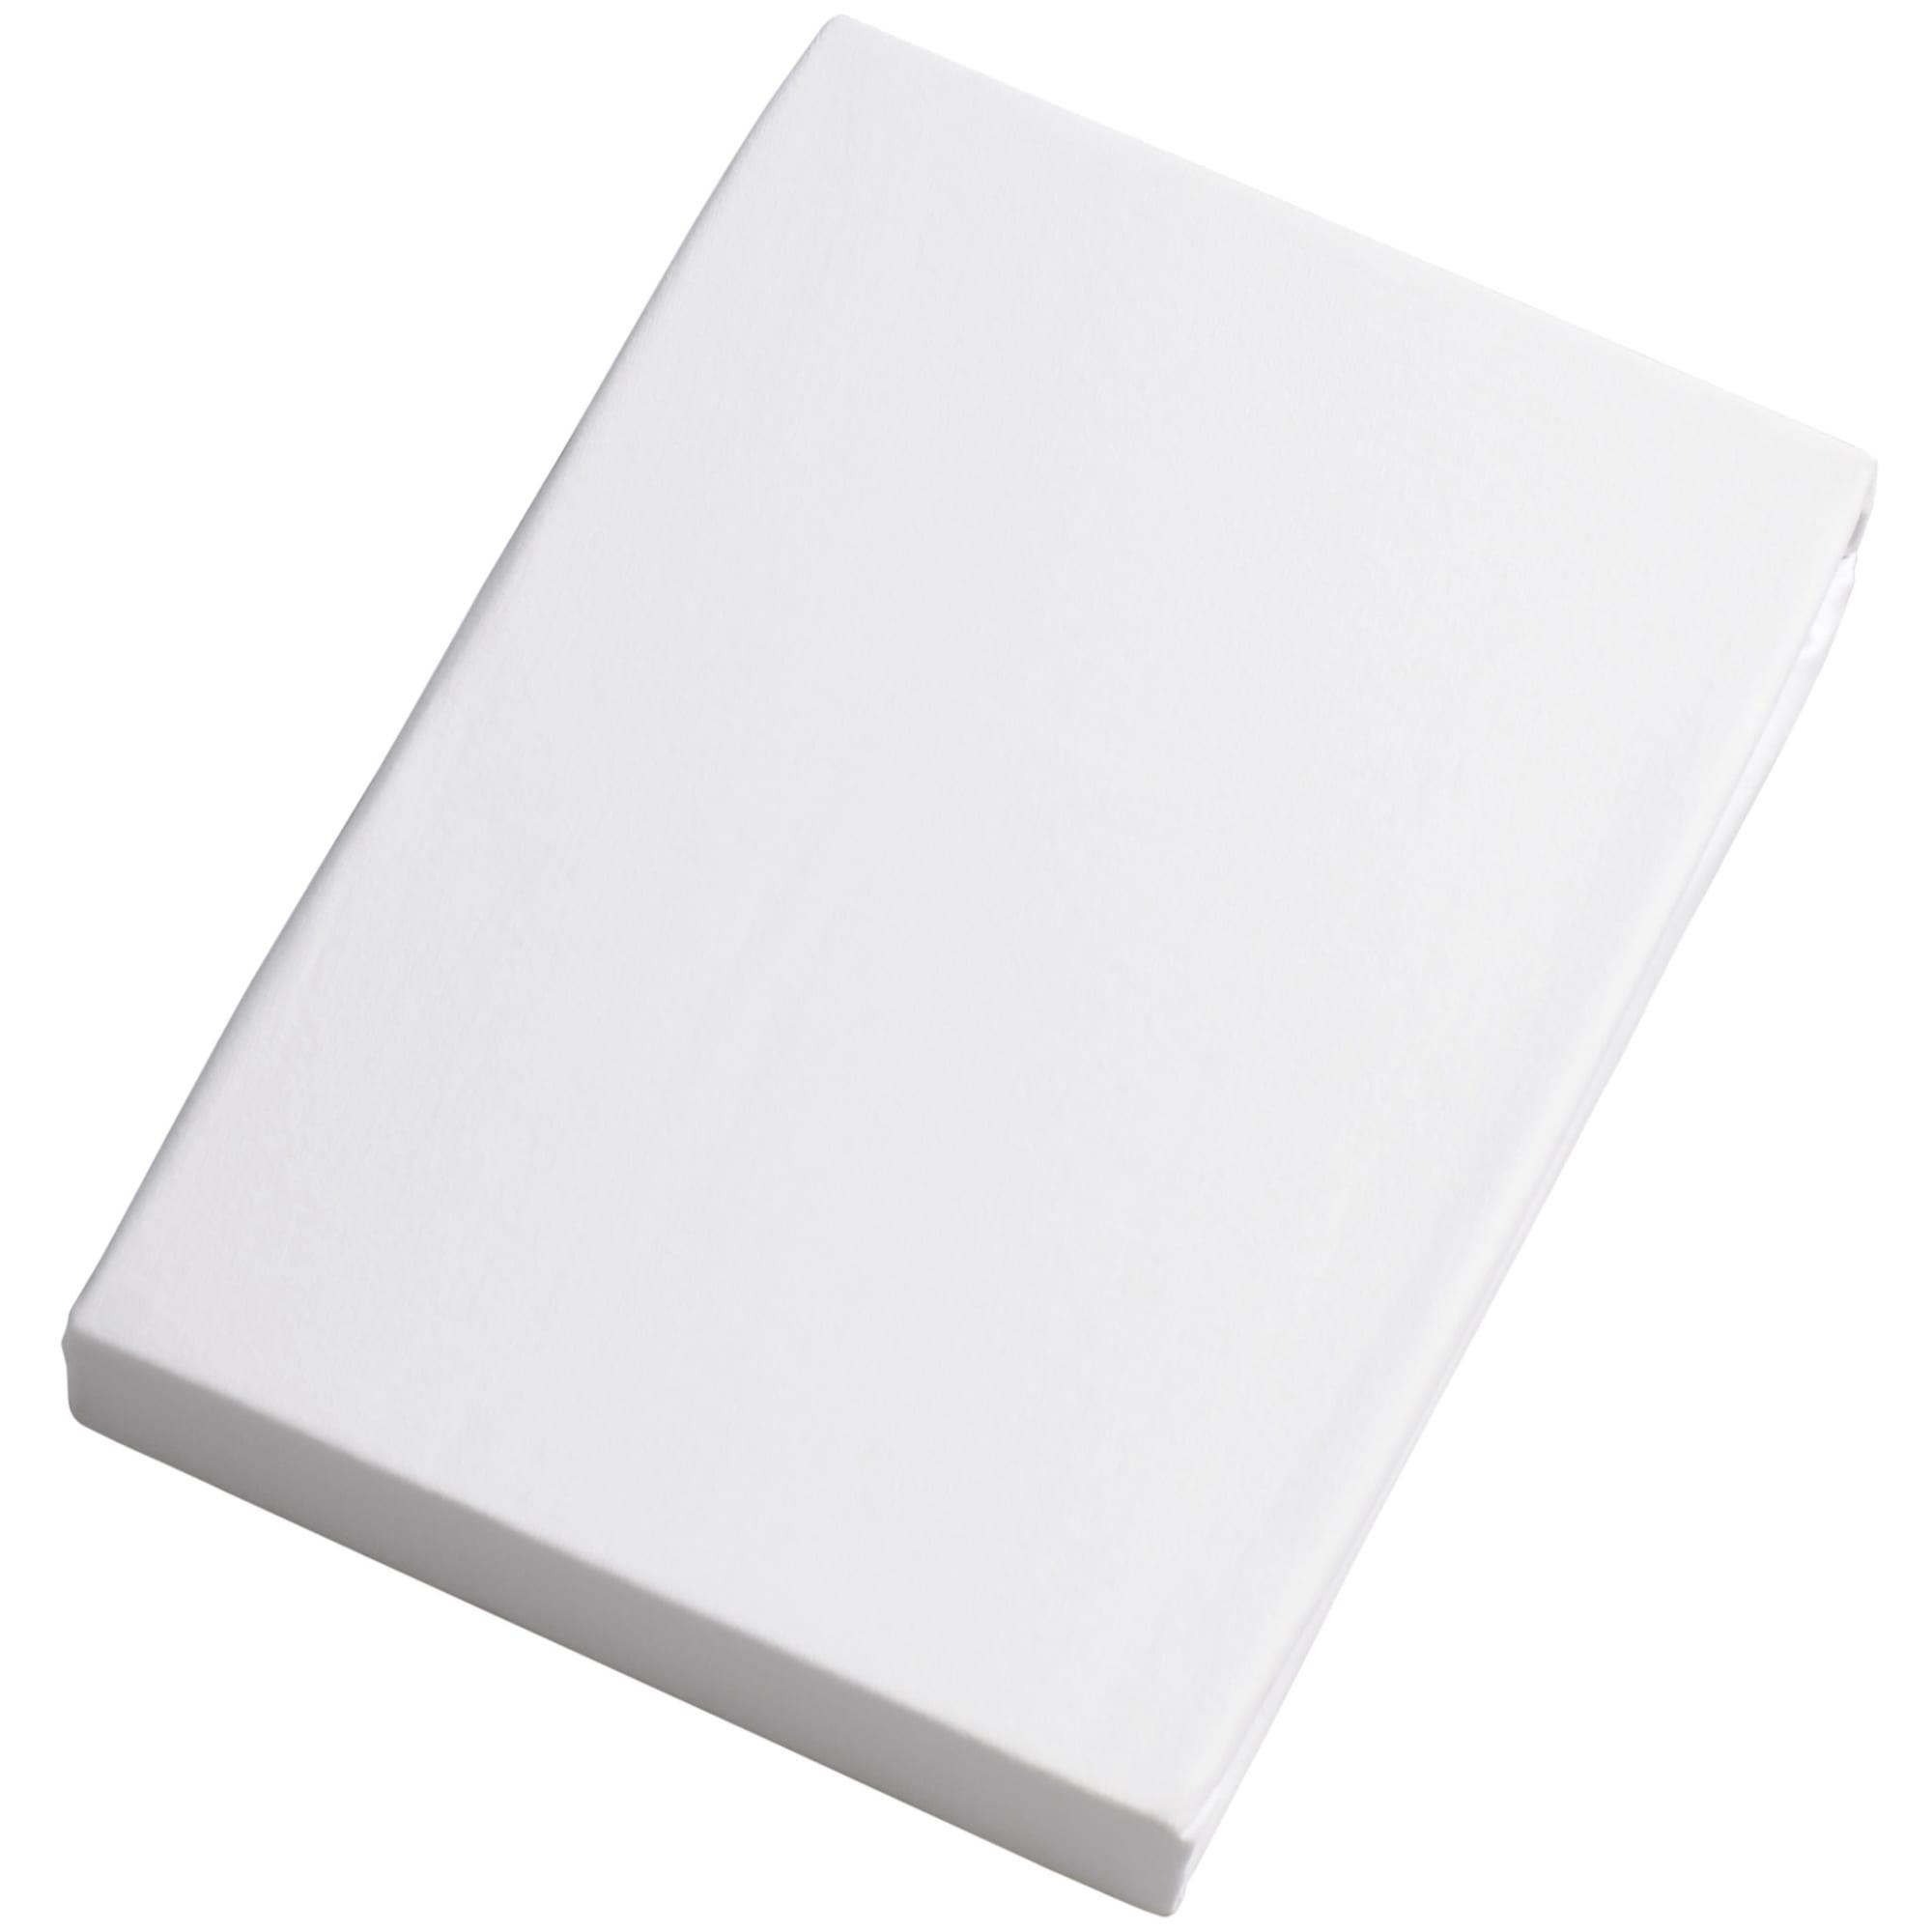 Bomuld/elastan - 180 x 200 x 38 cm